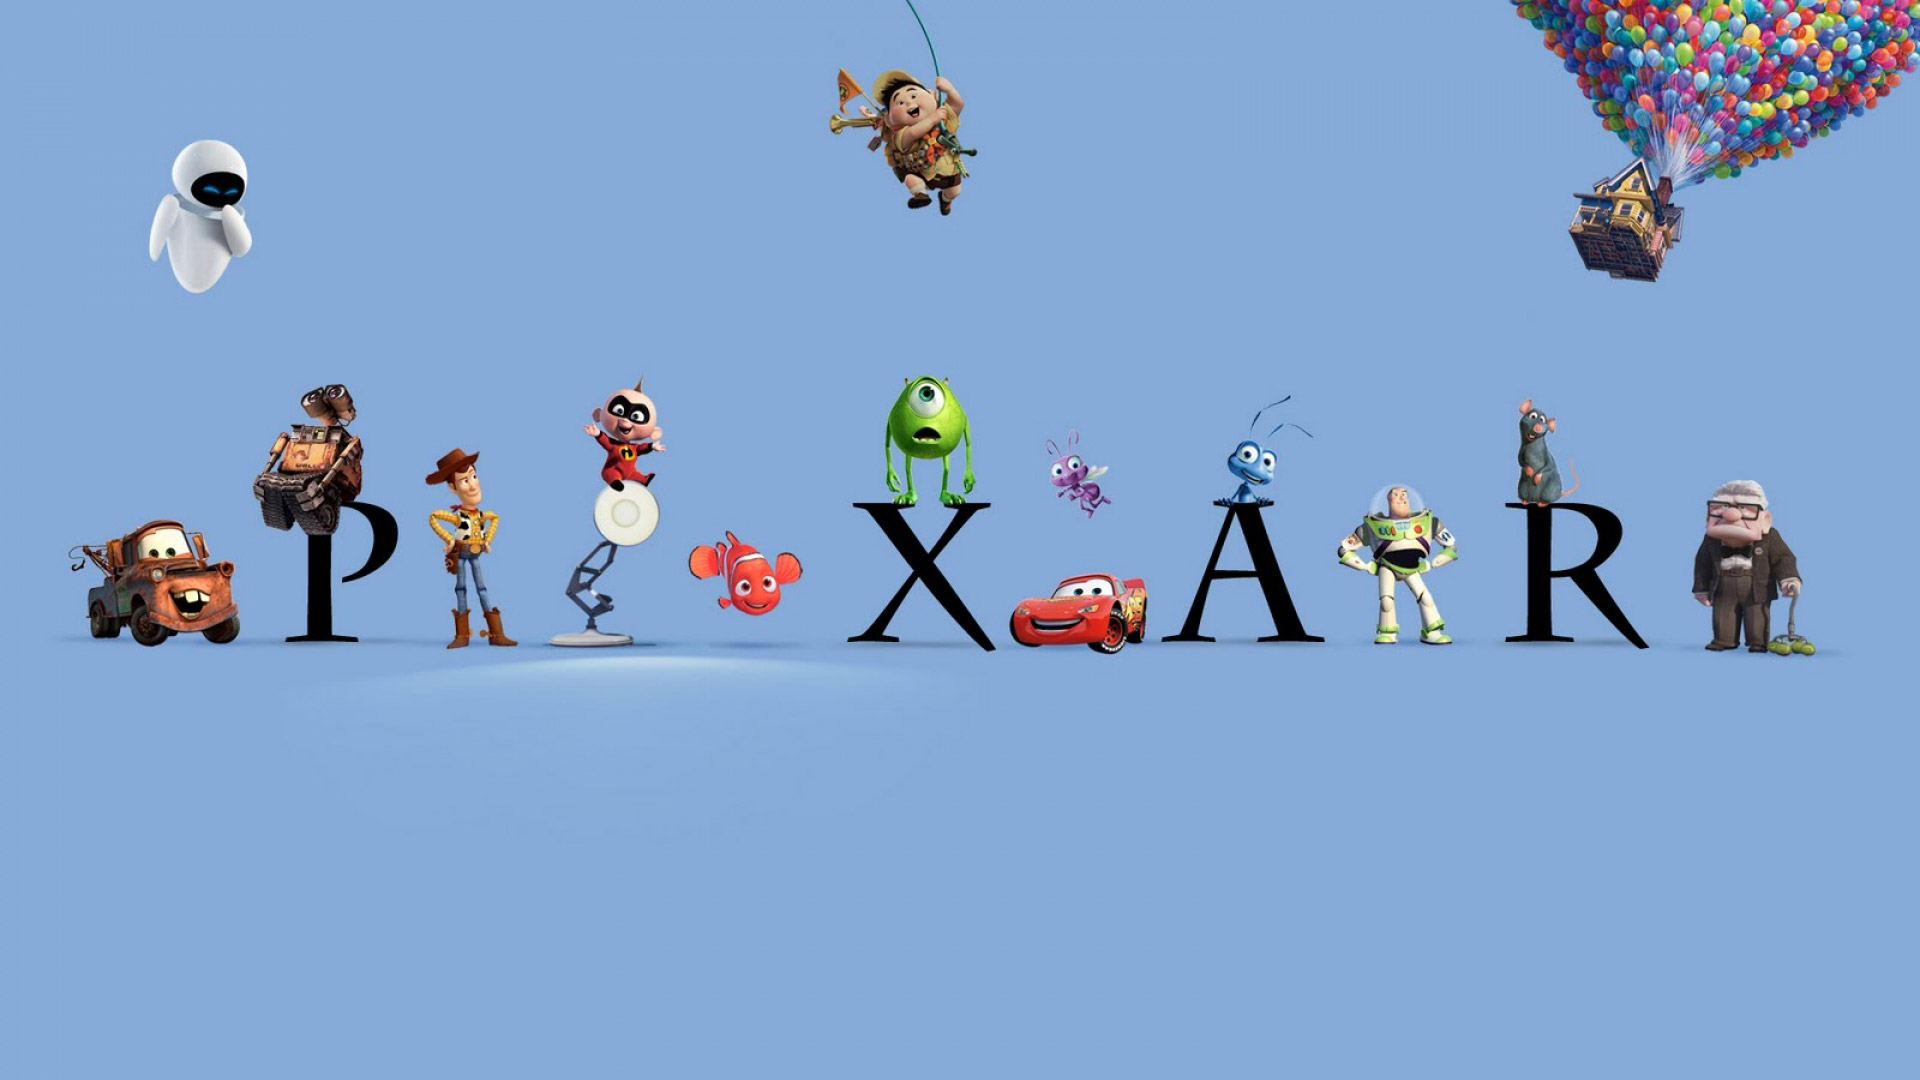 Disney Pixar Desktop Wallpaper 1920x1080